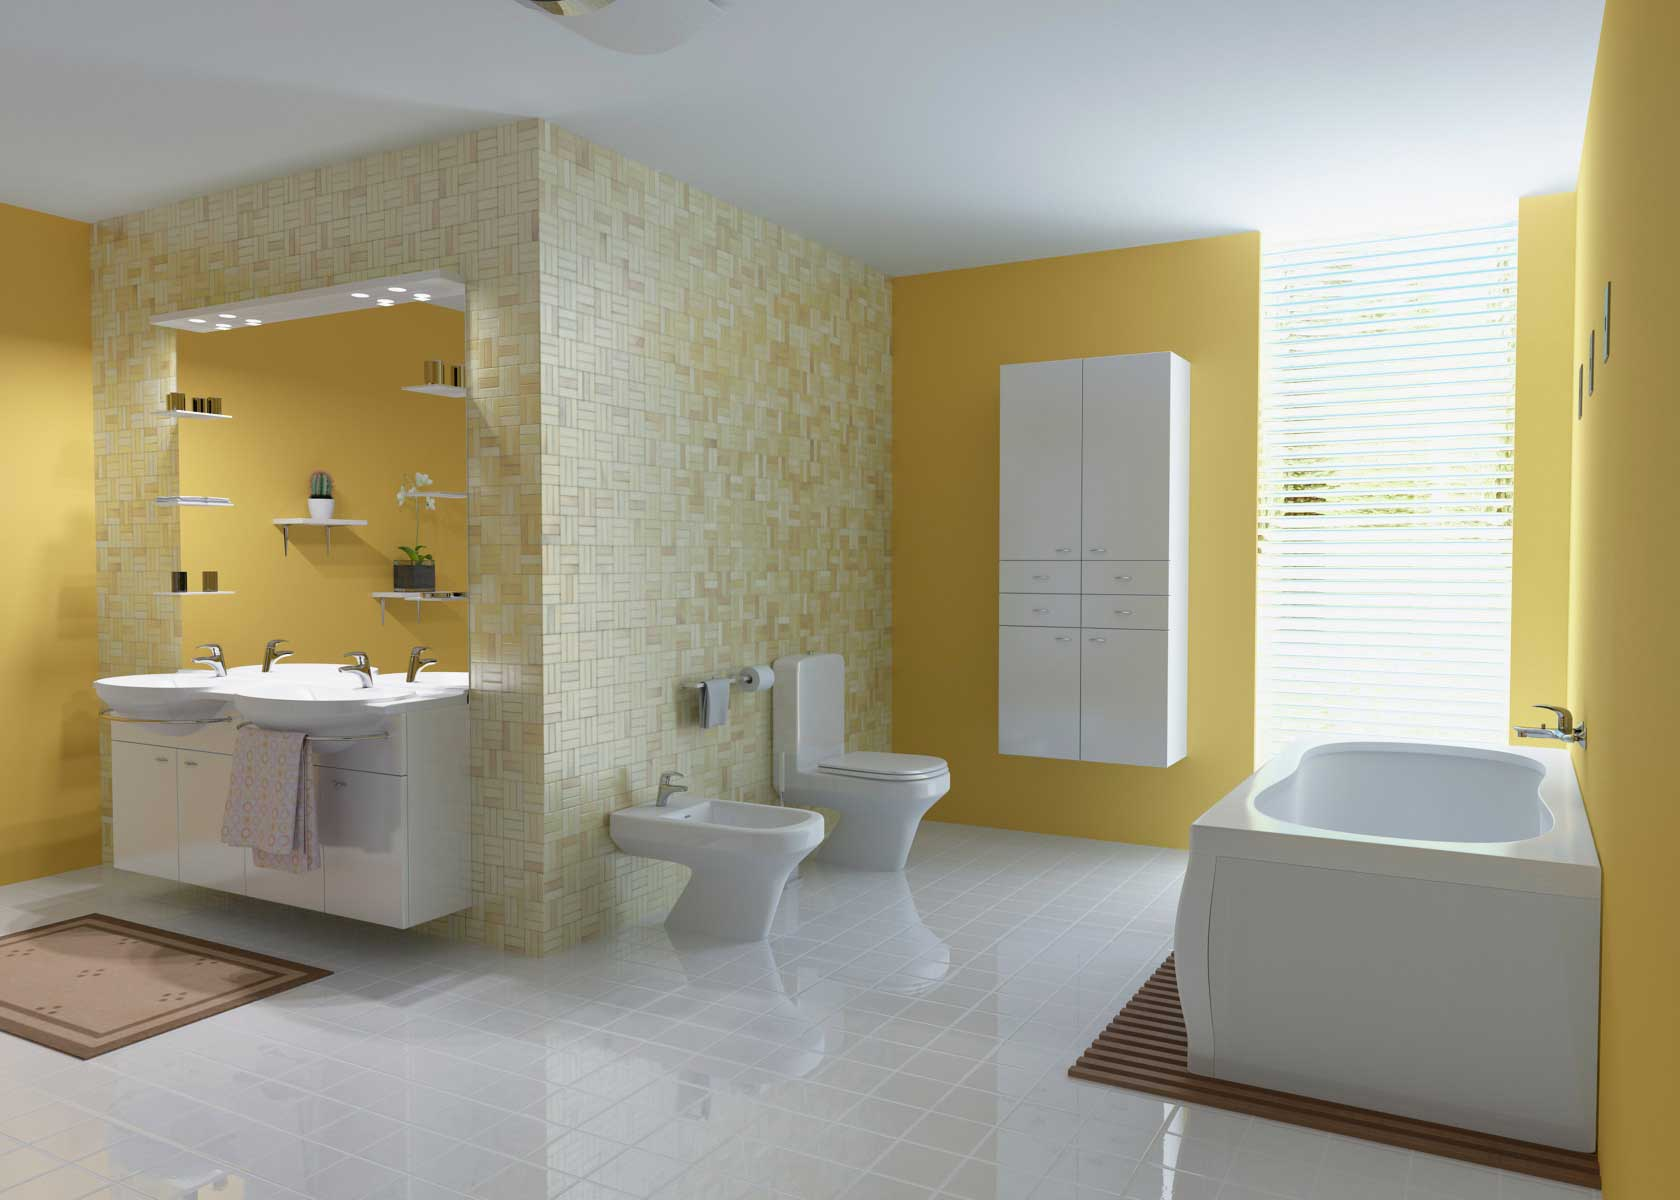 Большая бело-желтая ванная